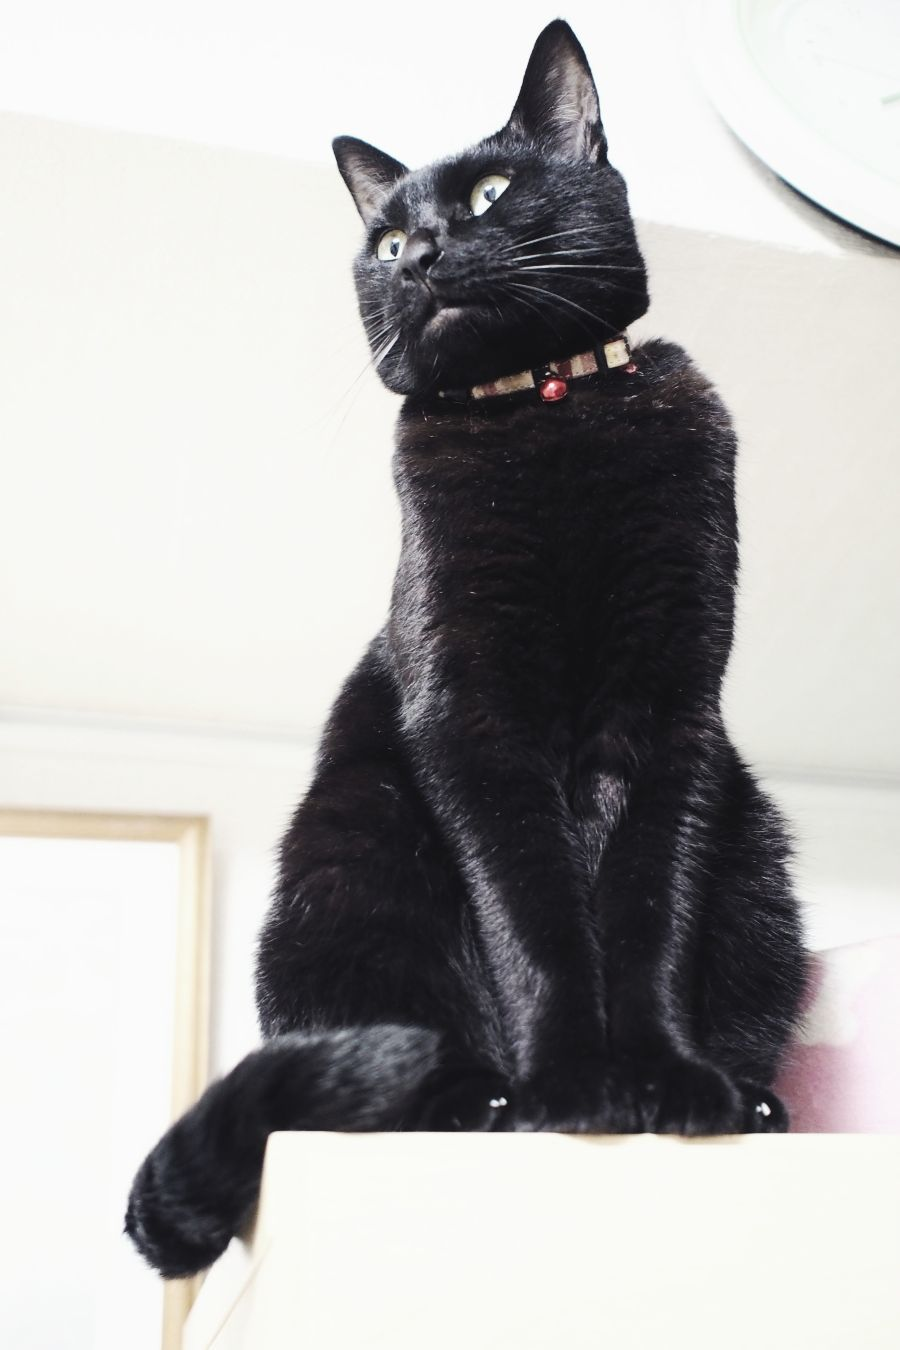 【Photo】ハロウィンは、黒猫_b0008655_19413588.jpg